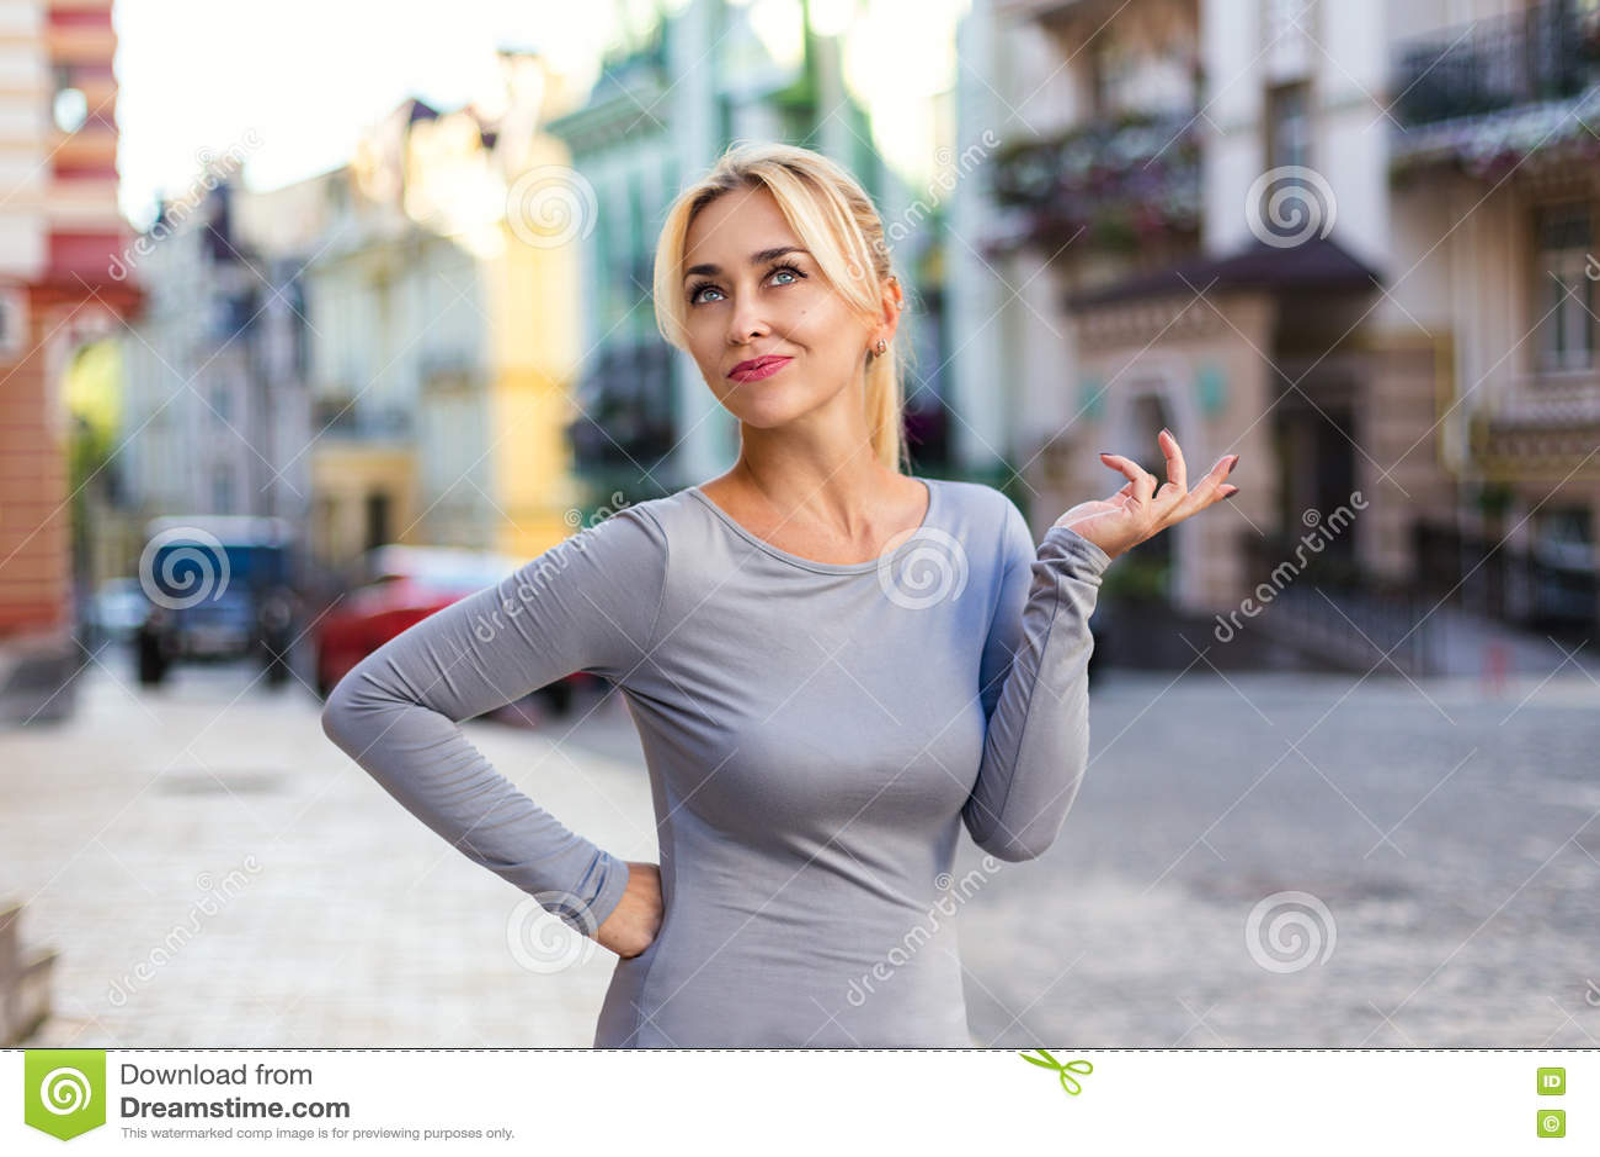 Blondevrouw met emotioneel gebaar